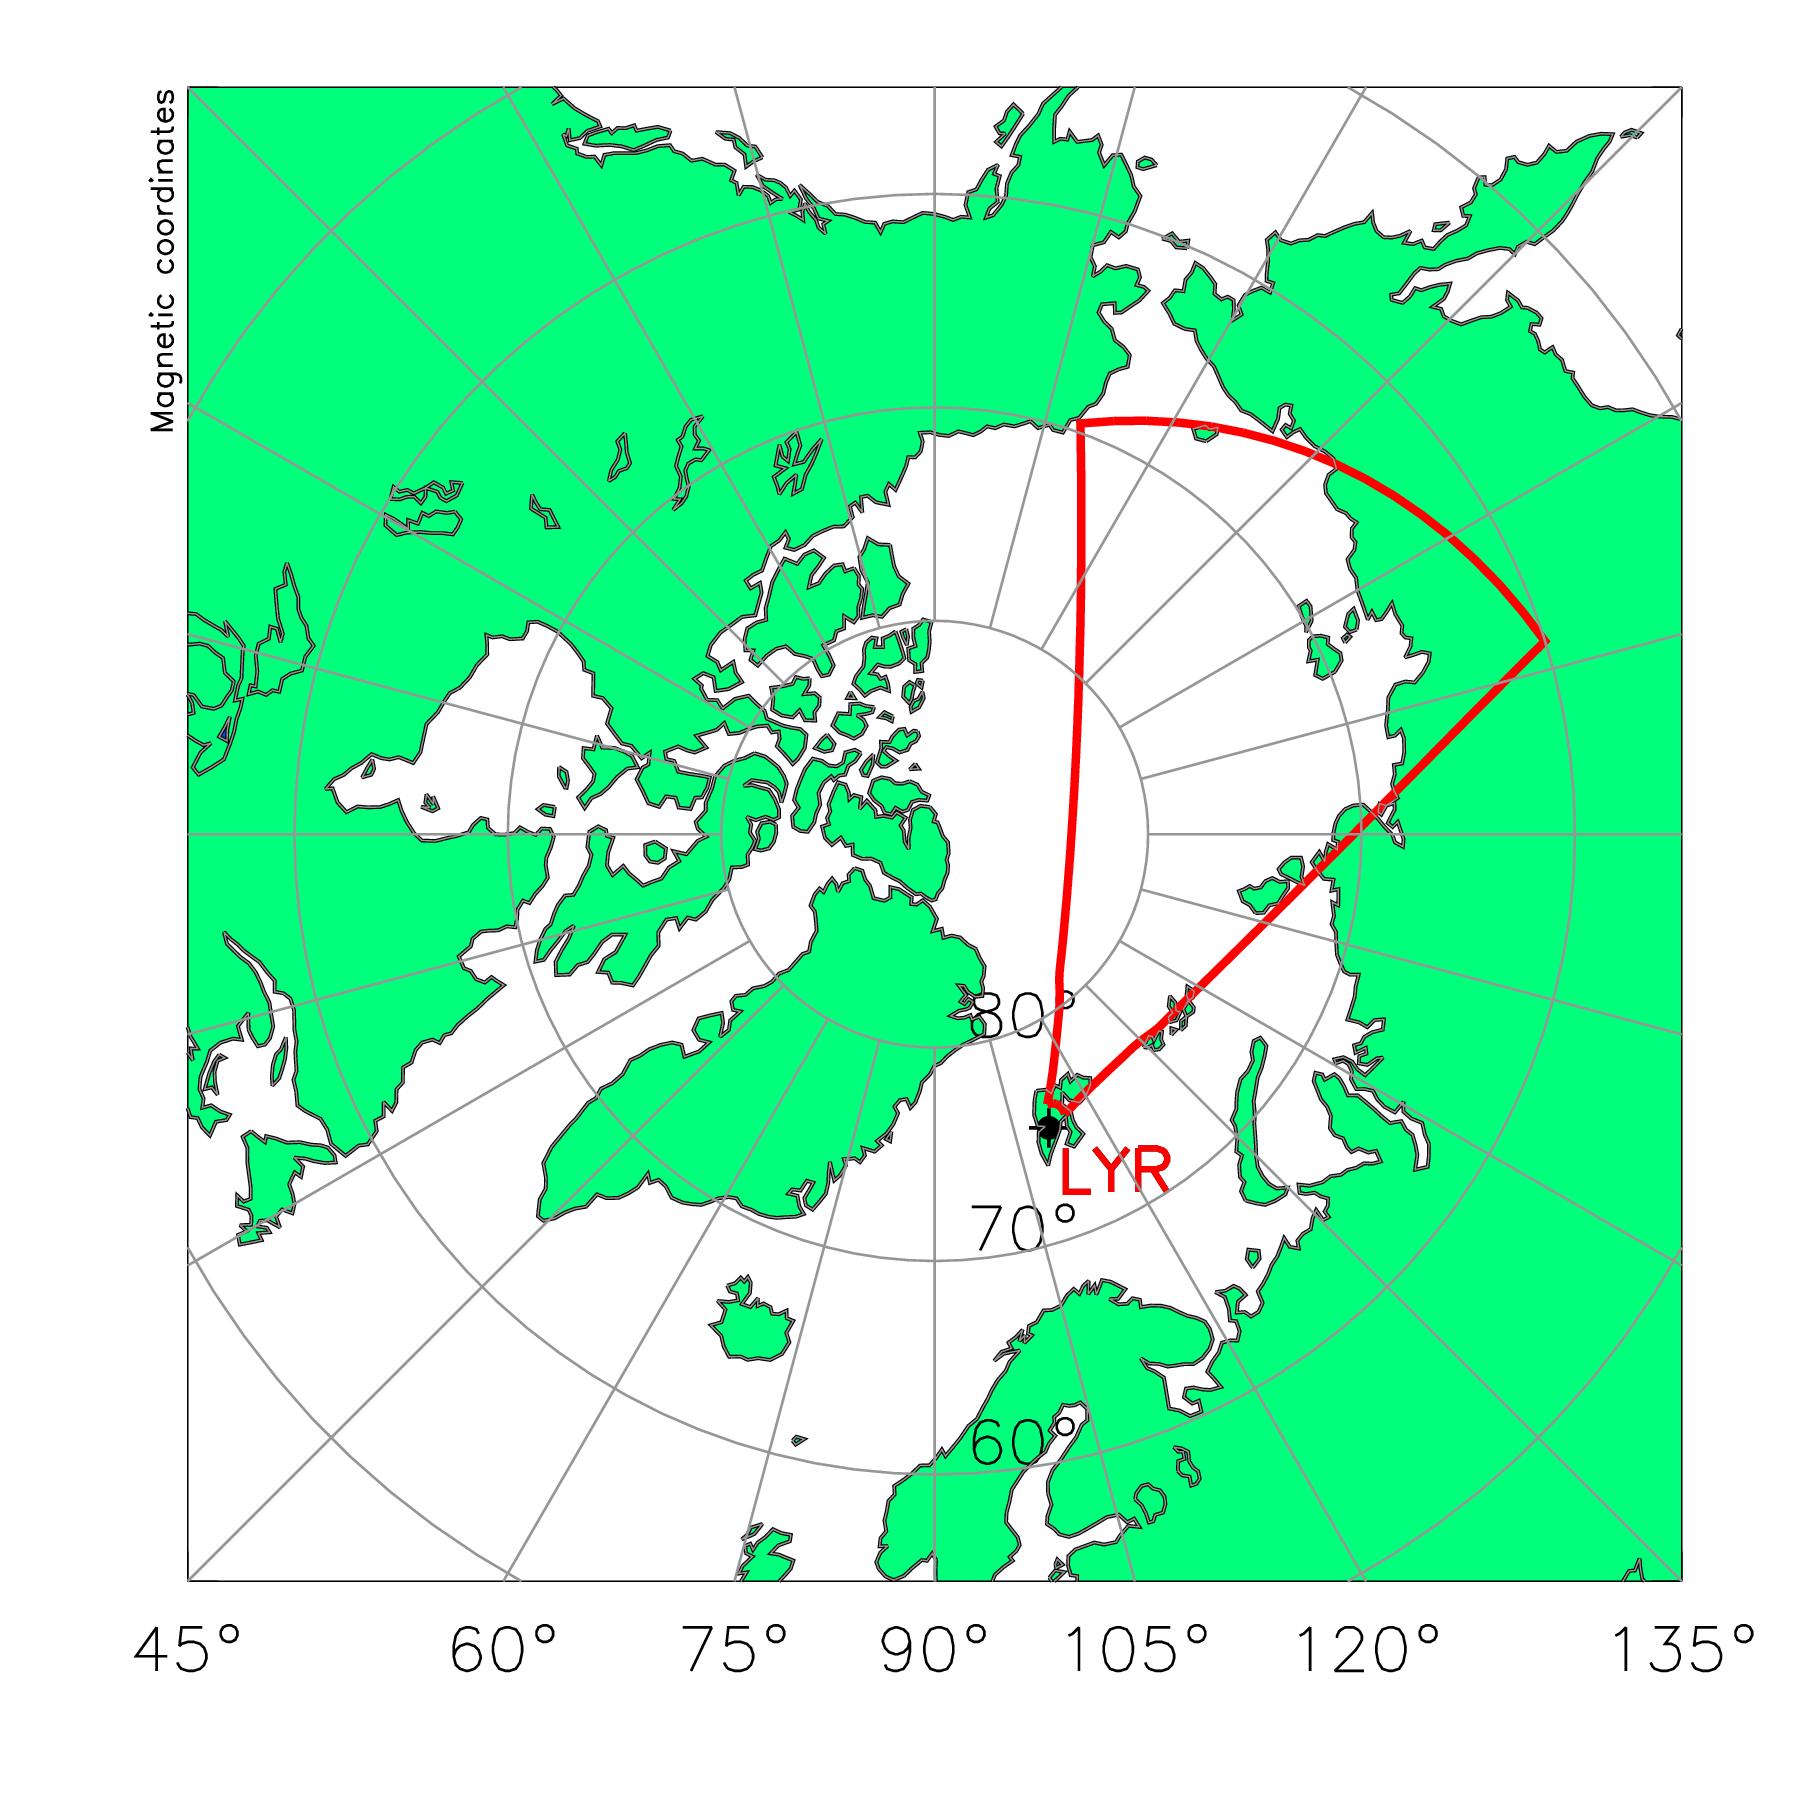 Longyearbyen Info : Virginia Tech SuperDARN